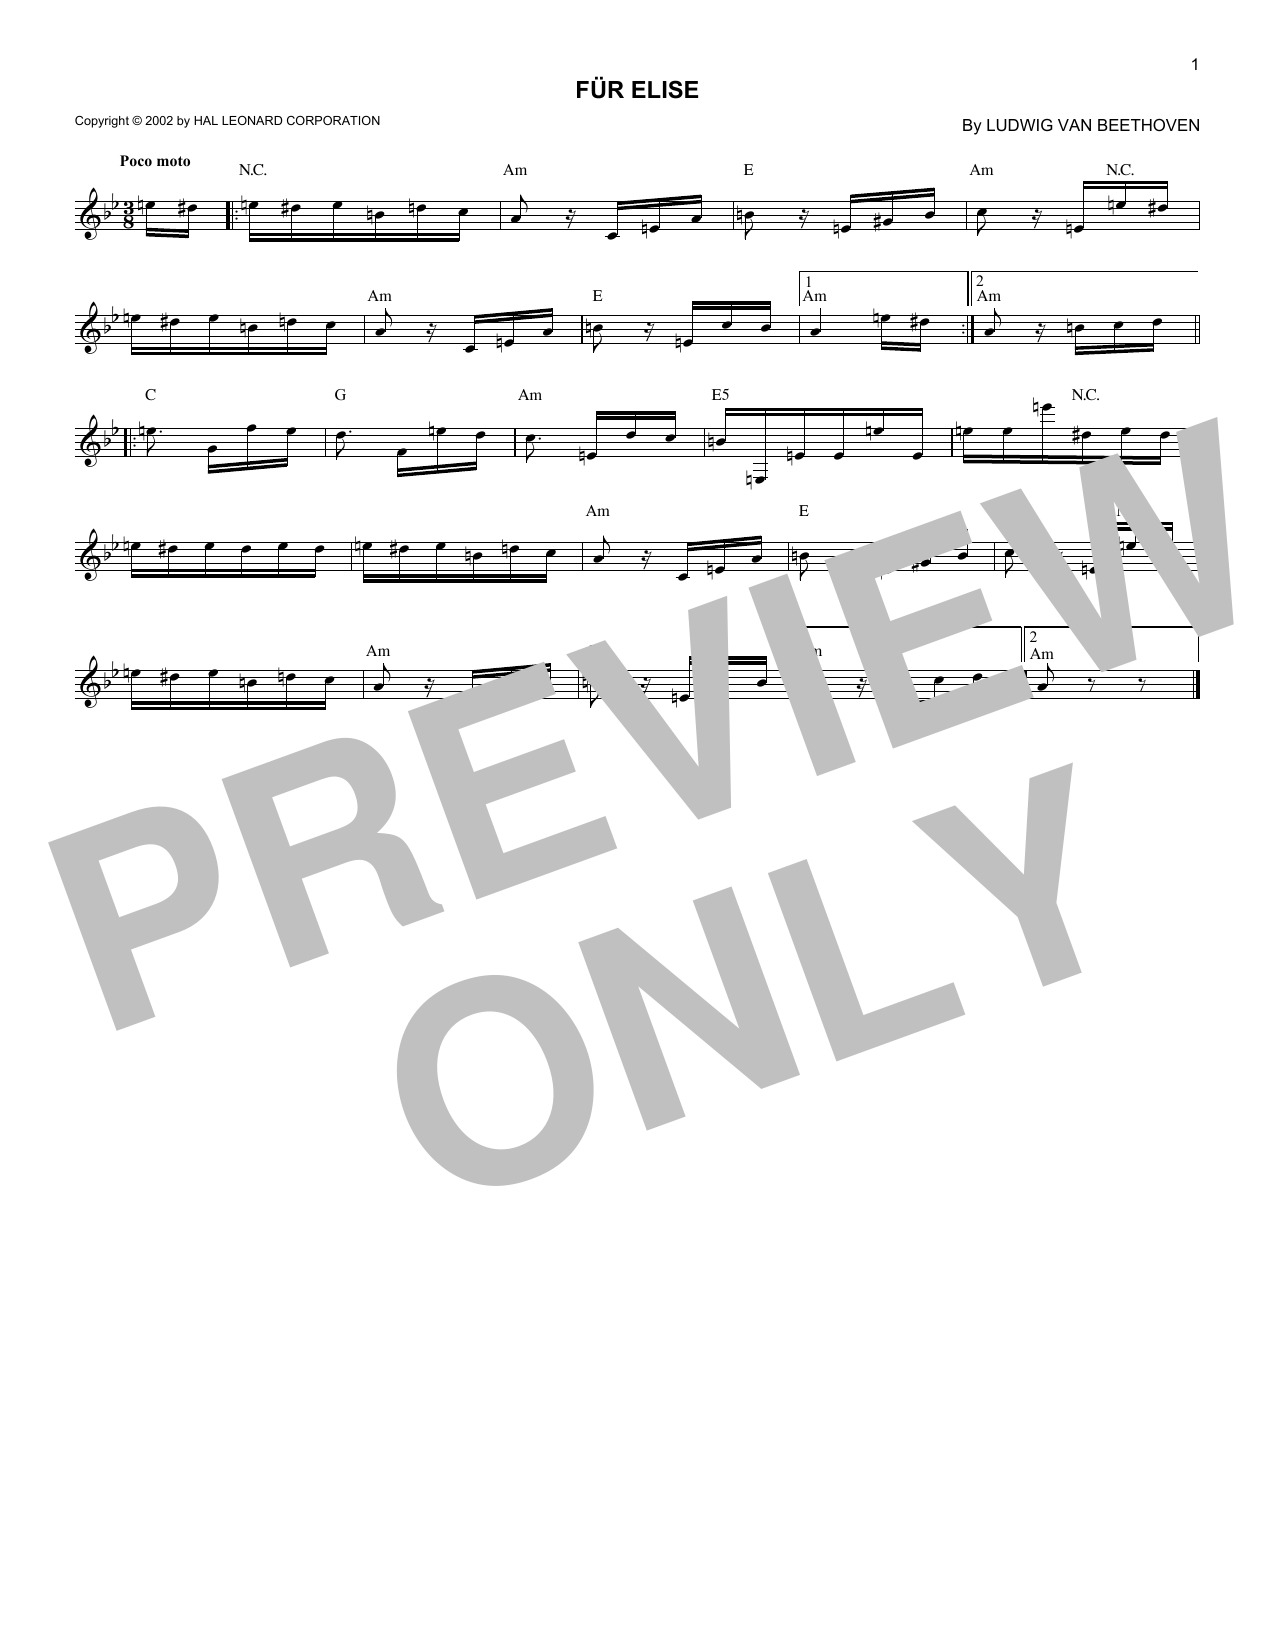 Ludwig van Beethoven Fur Elise, WoO 59 sheet music notes and chords. Download Printable PDF.